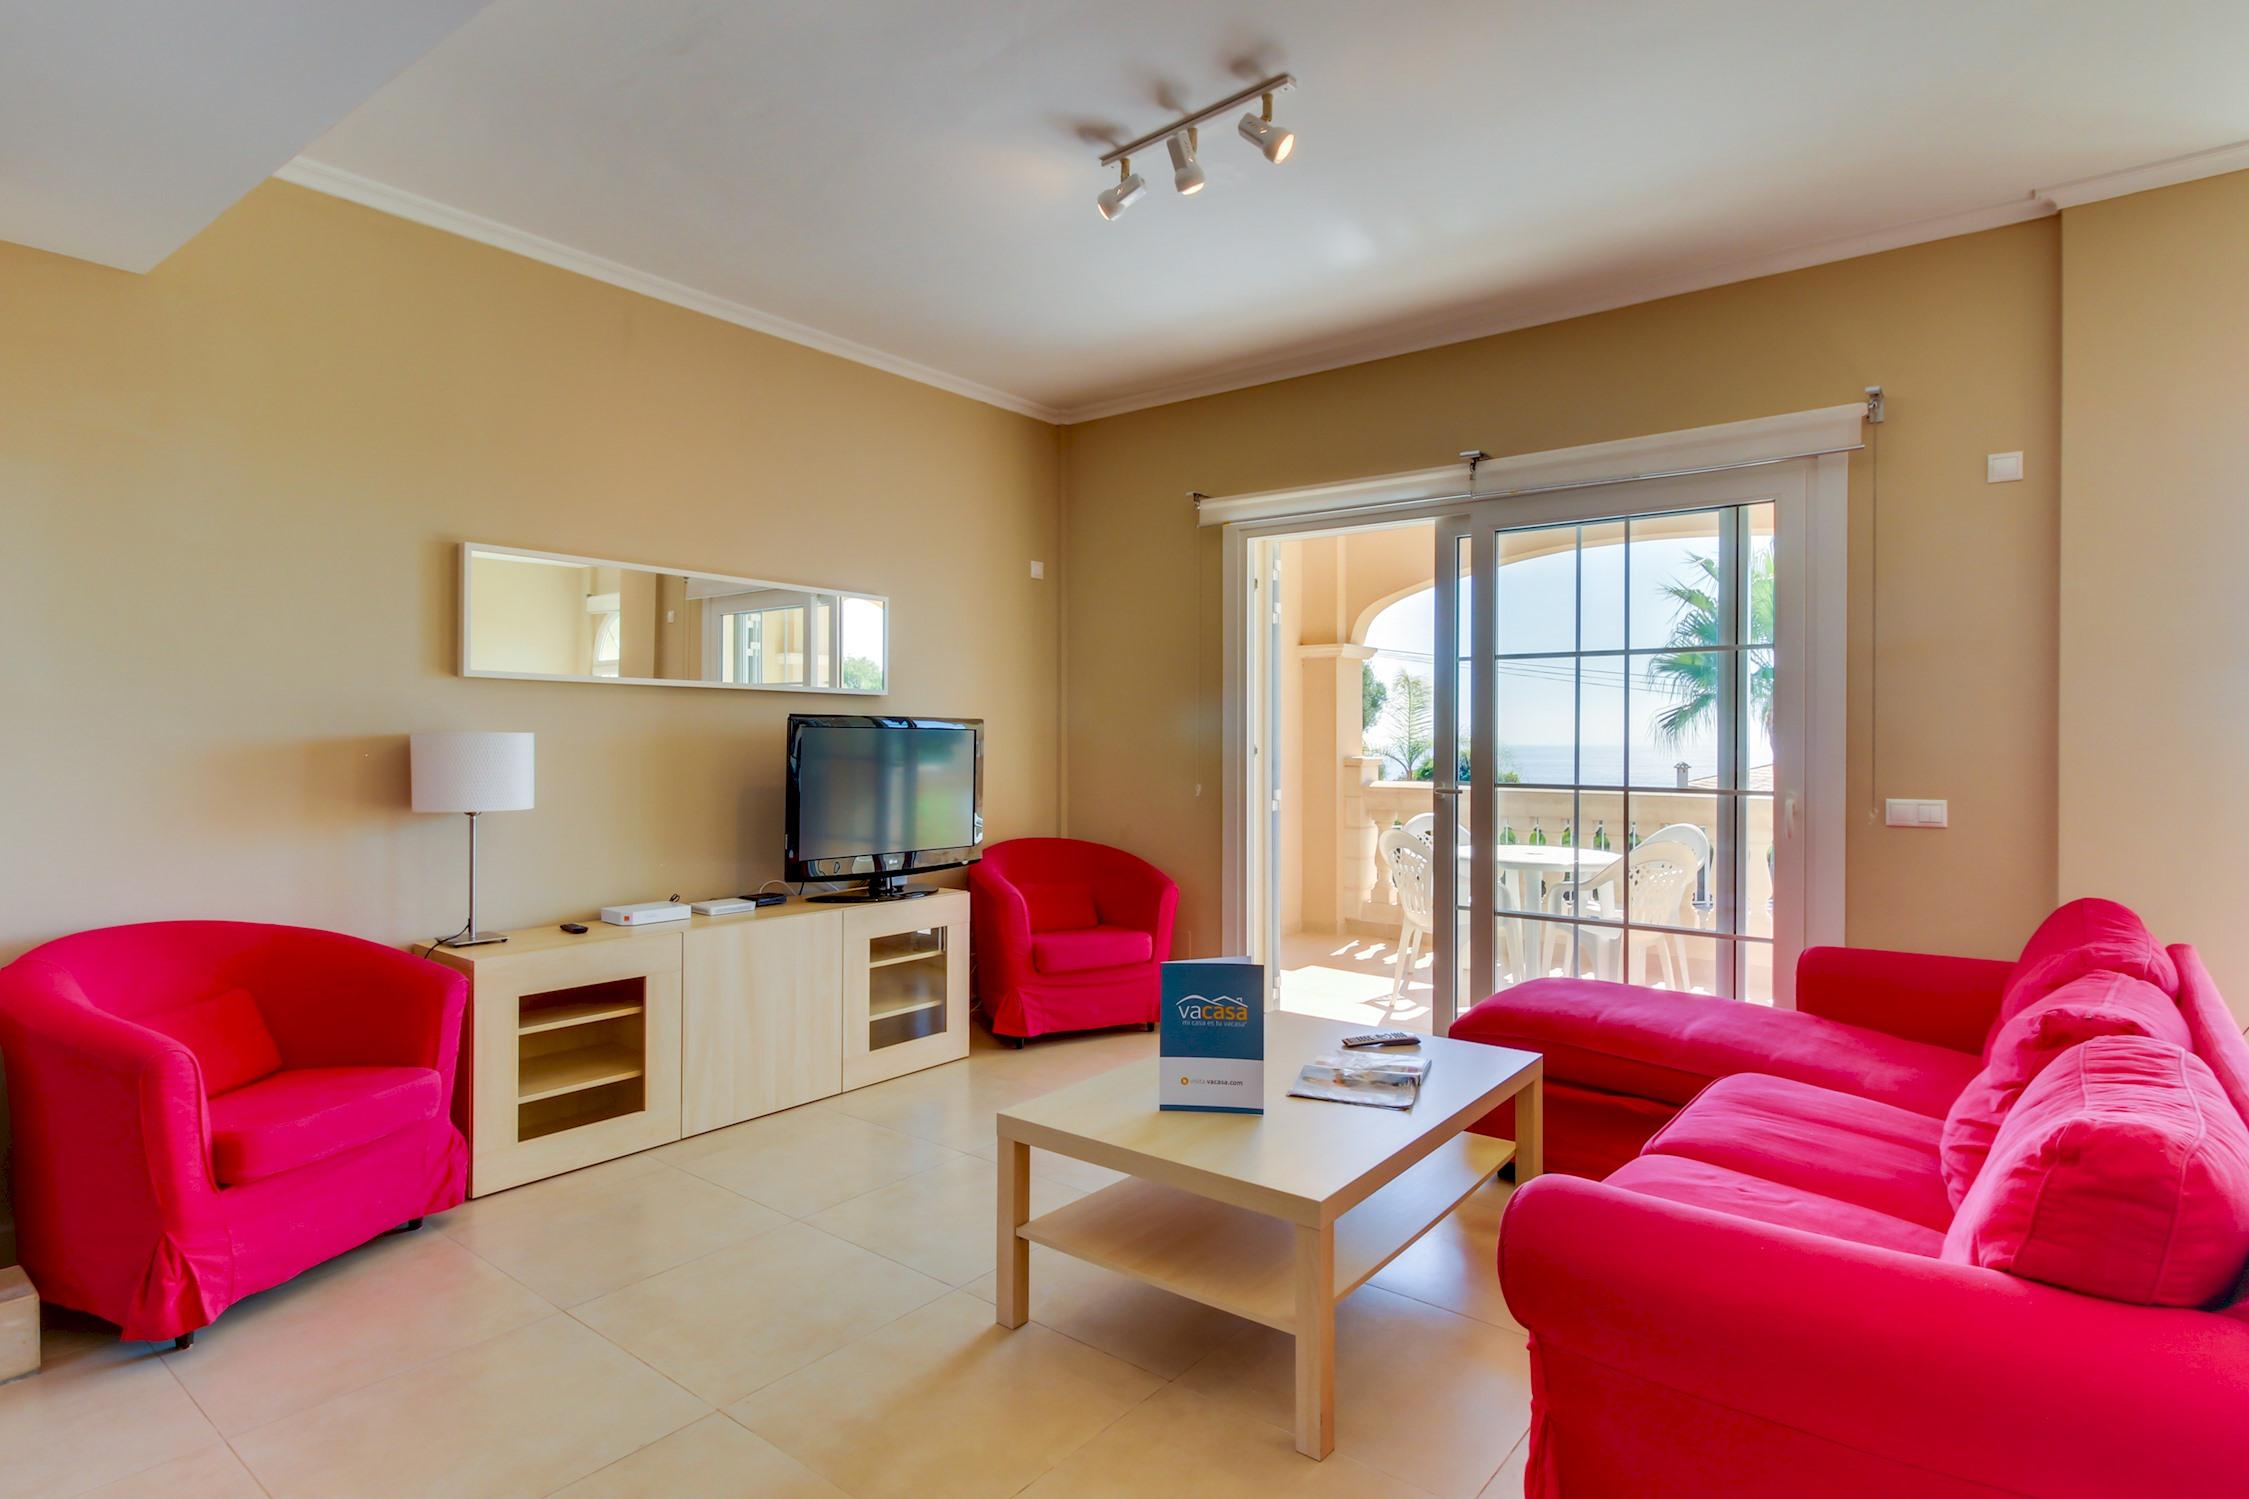 Apartment Villa Bonavista photo 20548789